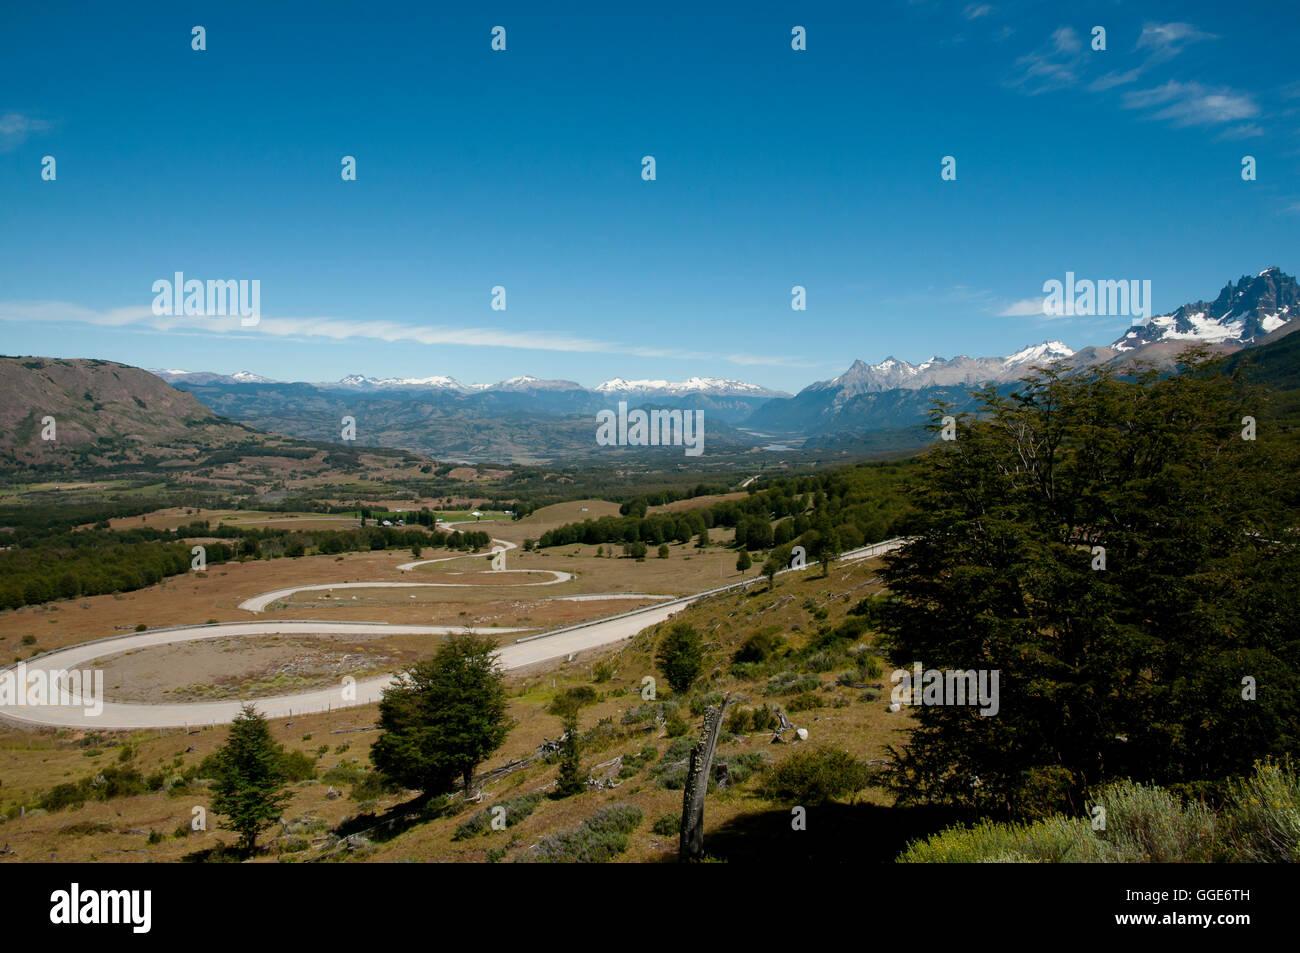 Carretera Austral Road - Chile - Stock Image